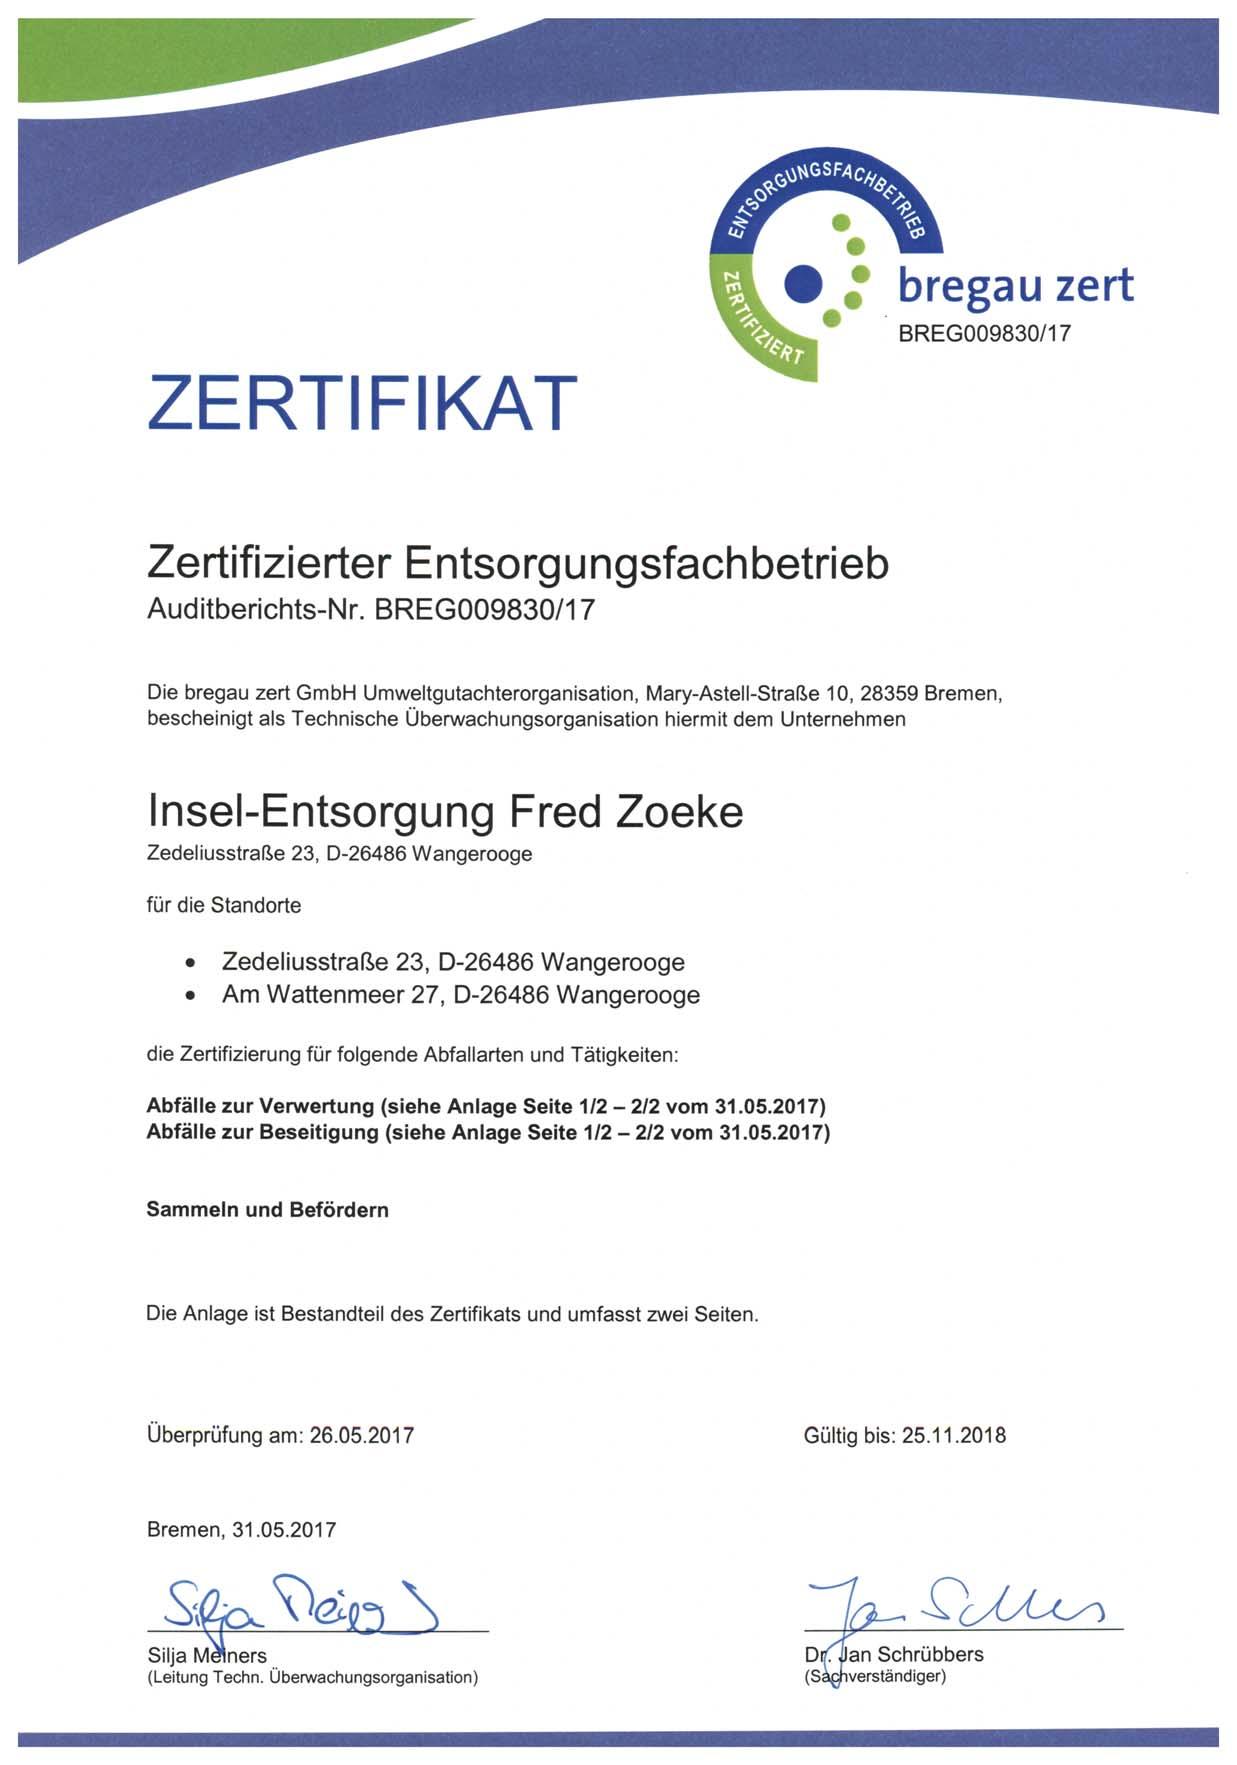 Zertifikat2017.jpg